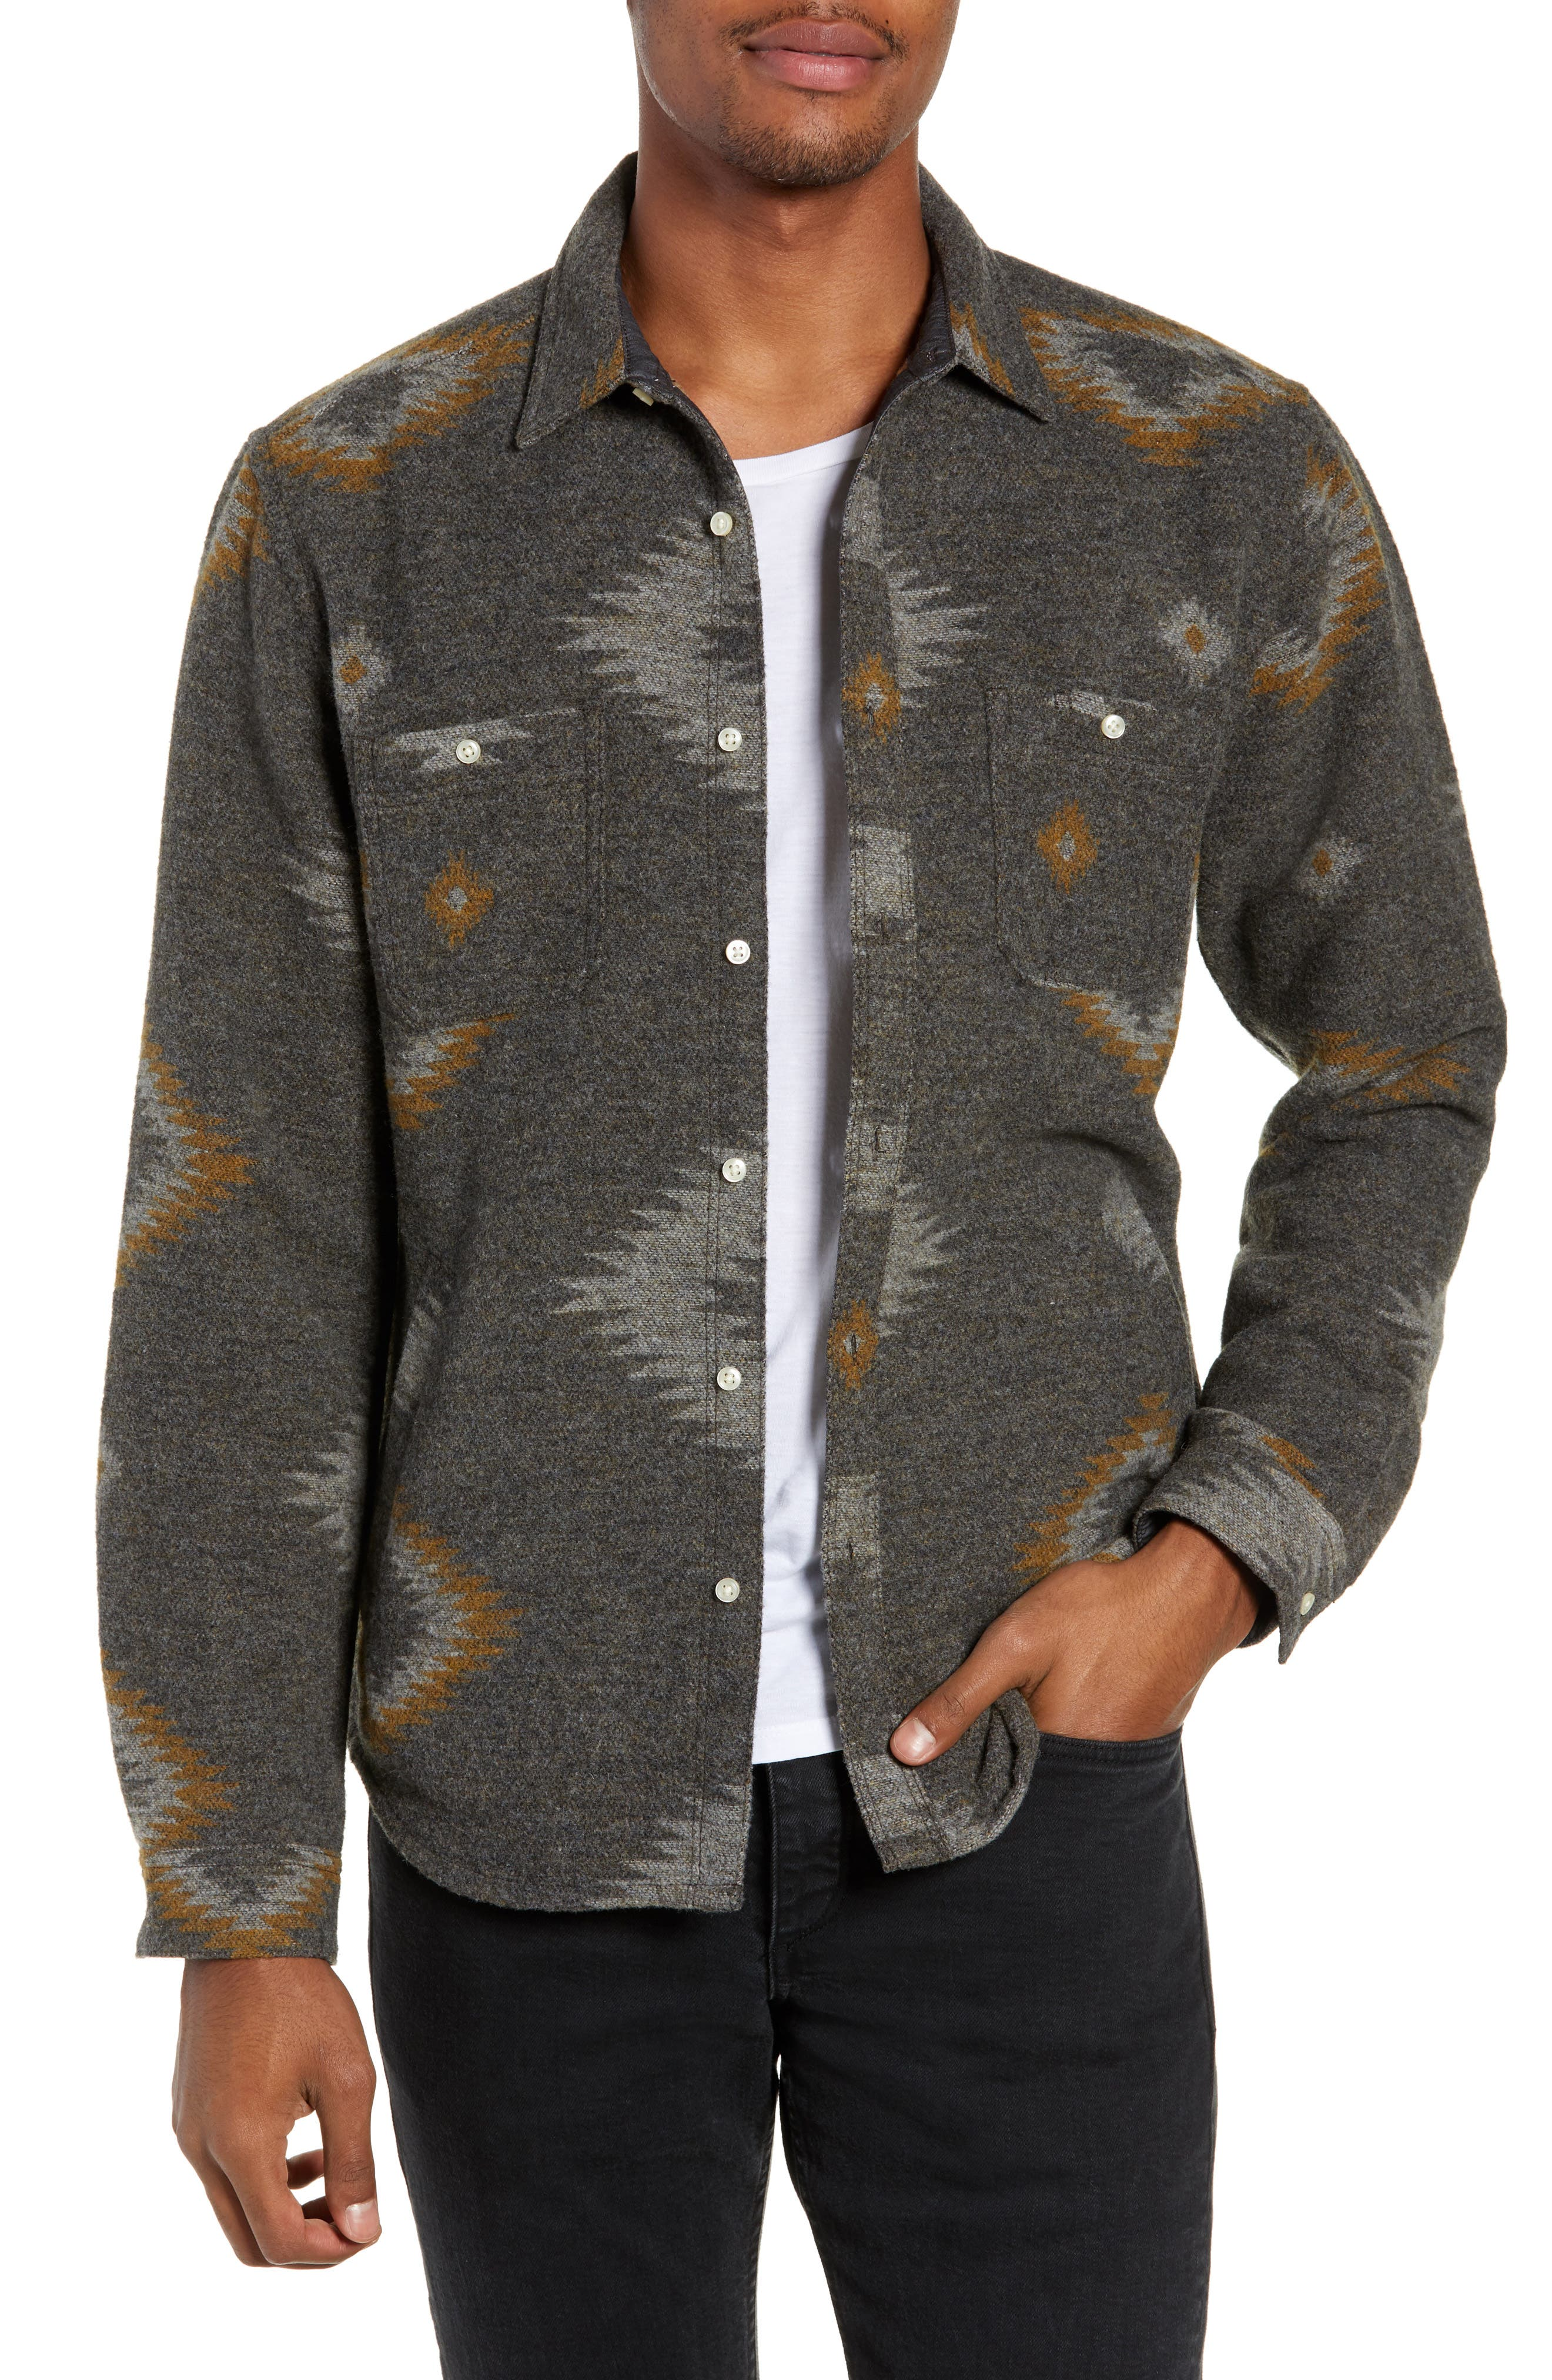 Warrior Regular Fit Wool Blend Shirt Jacket,                         Main,                         color, HEATHER CHARCOAL